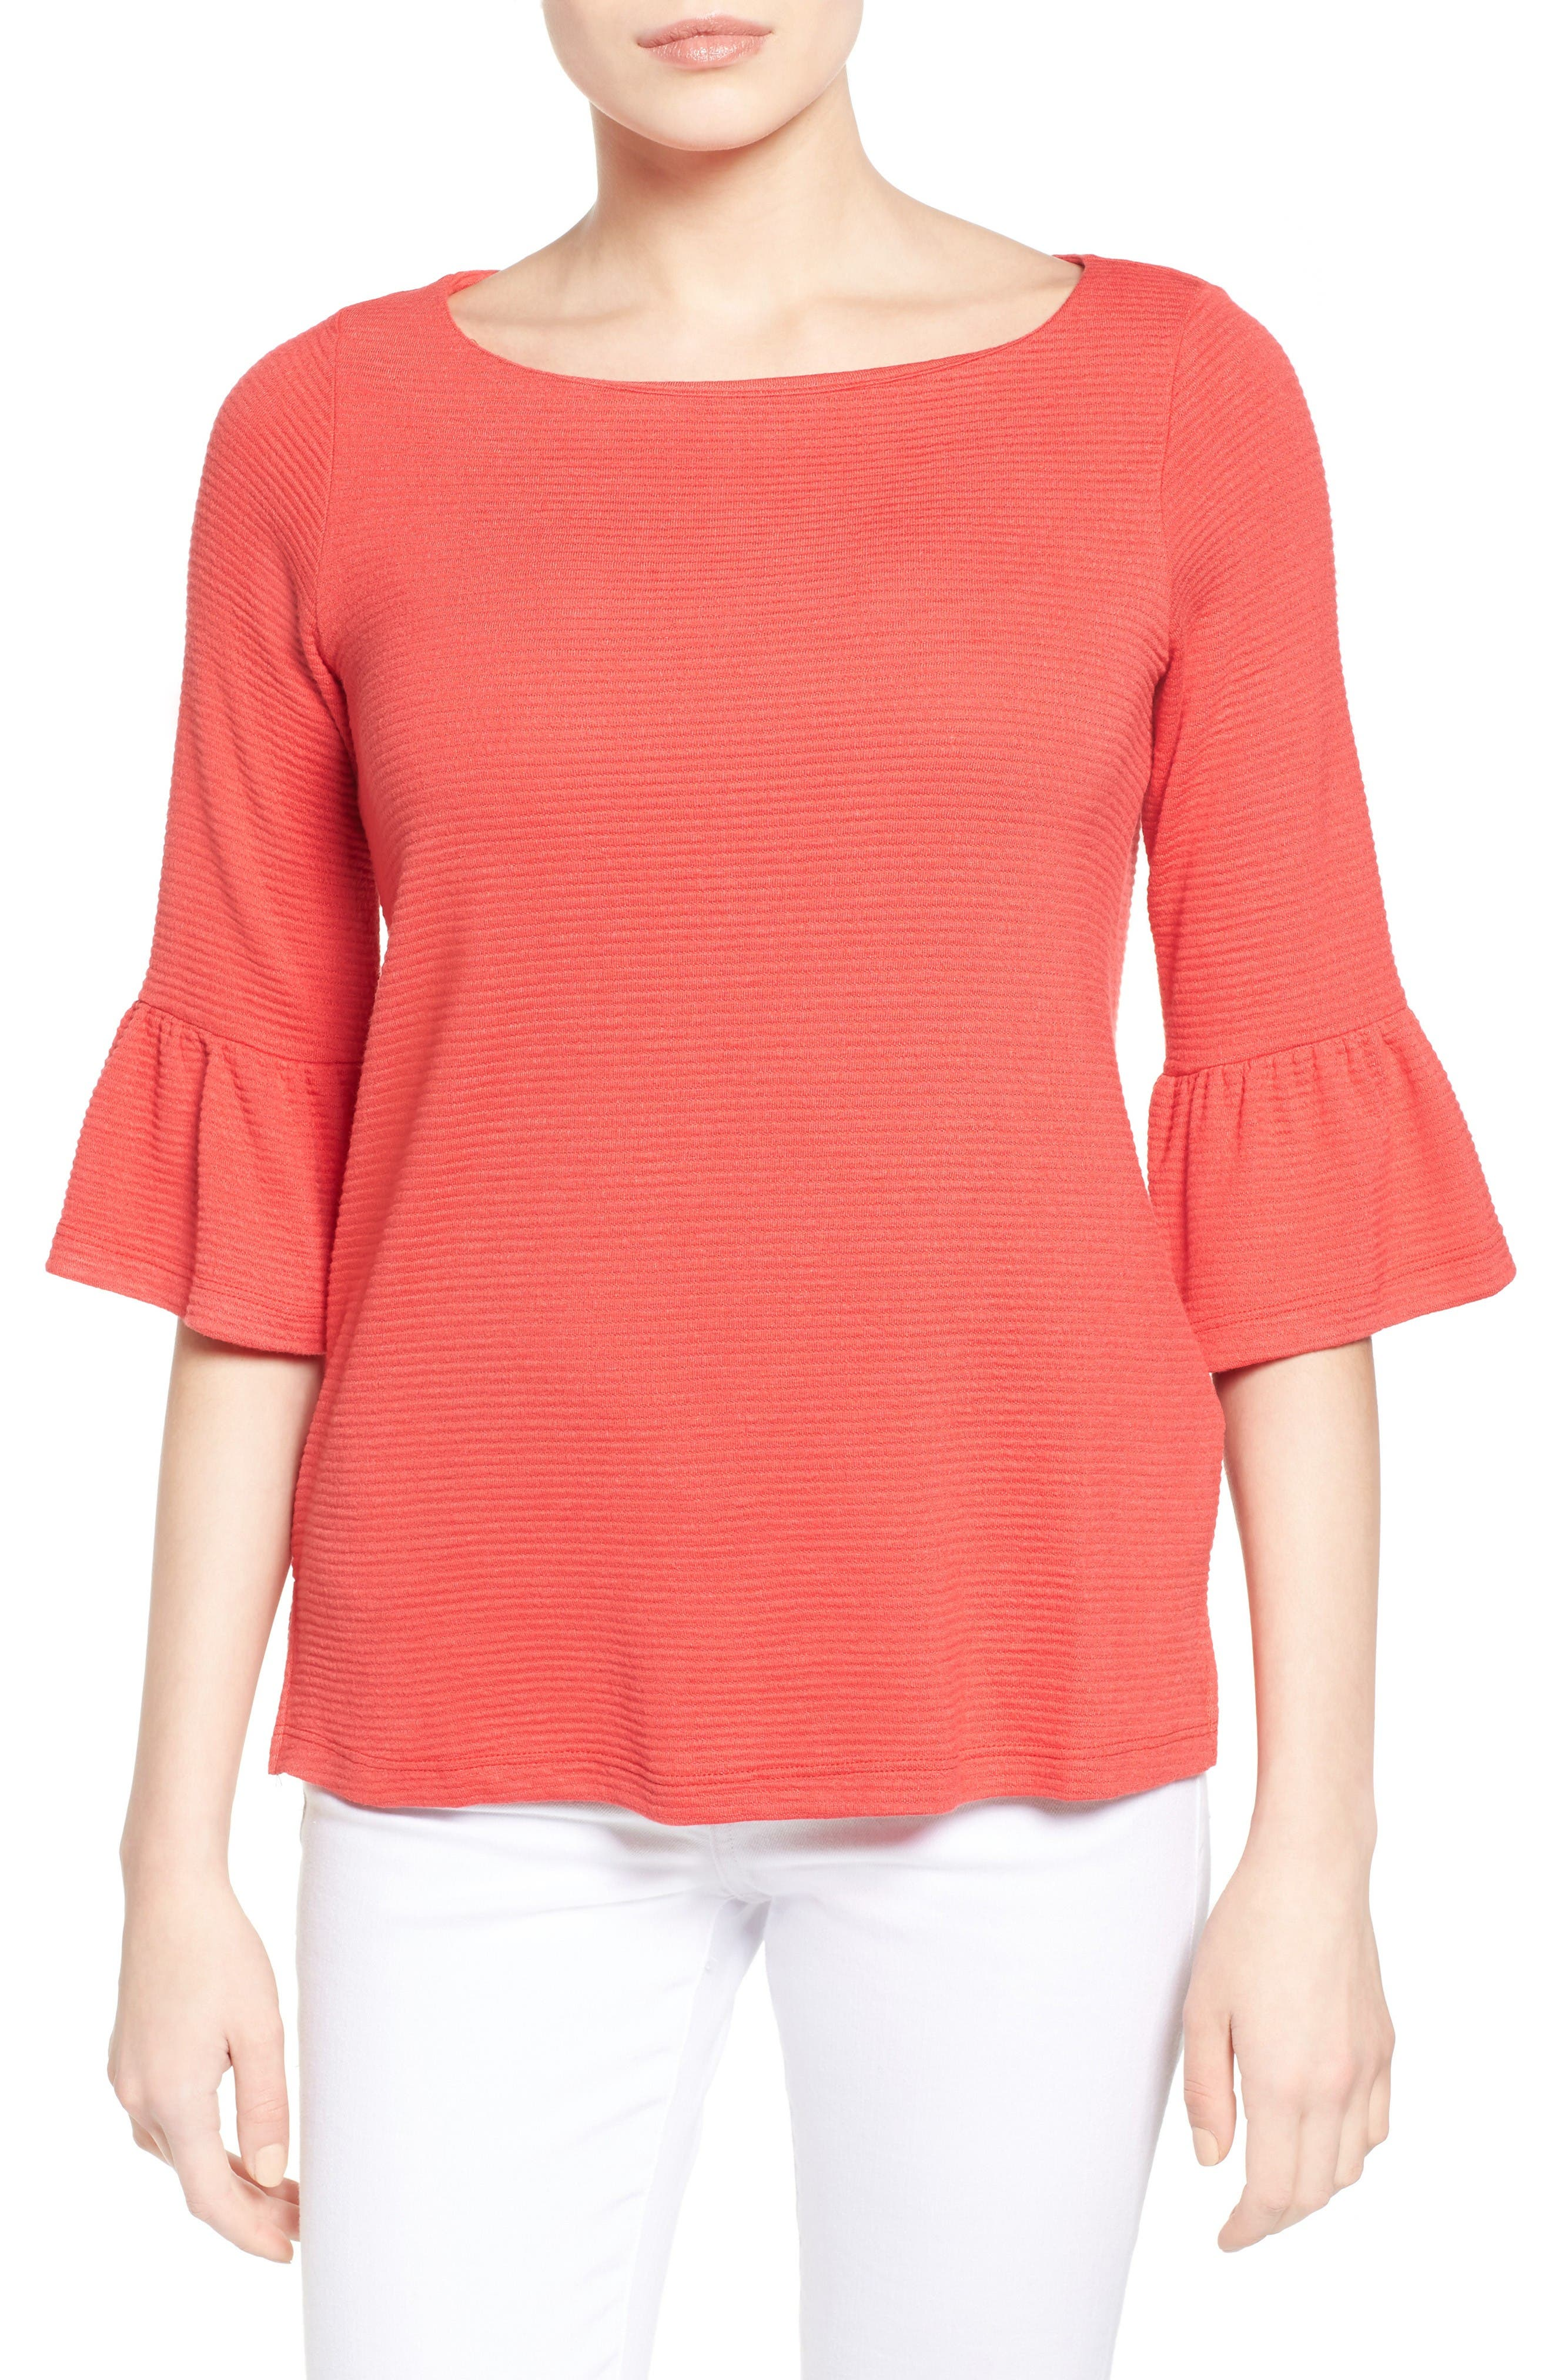 Alternate Image 1 Selected - Pleione Stripe Knit Bell Sleeve Top (Regular & Petite)